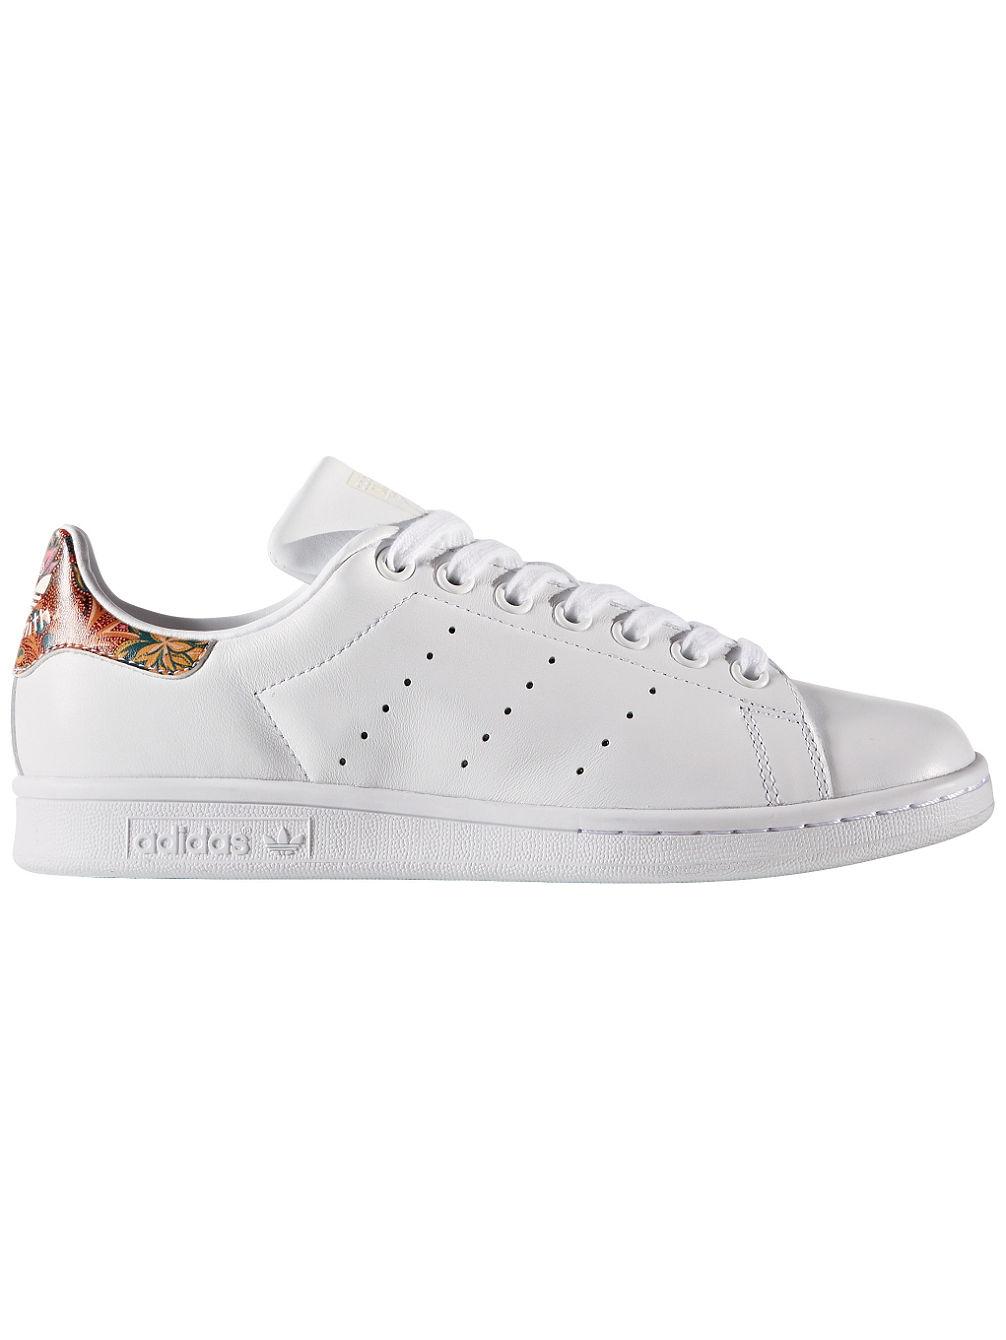 san francisco 7361f 79999 Buy adidas Originals Stan Smith W Sneakers Women online at Blue Tomato